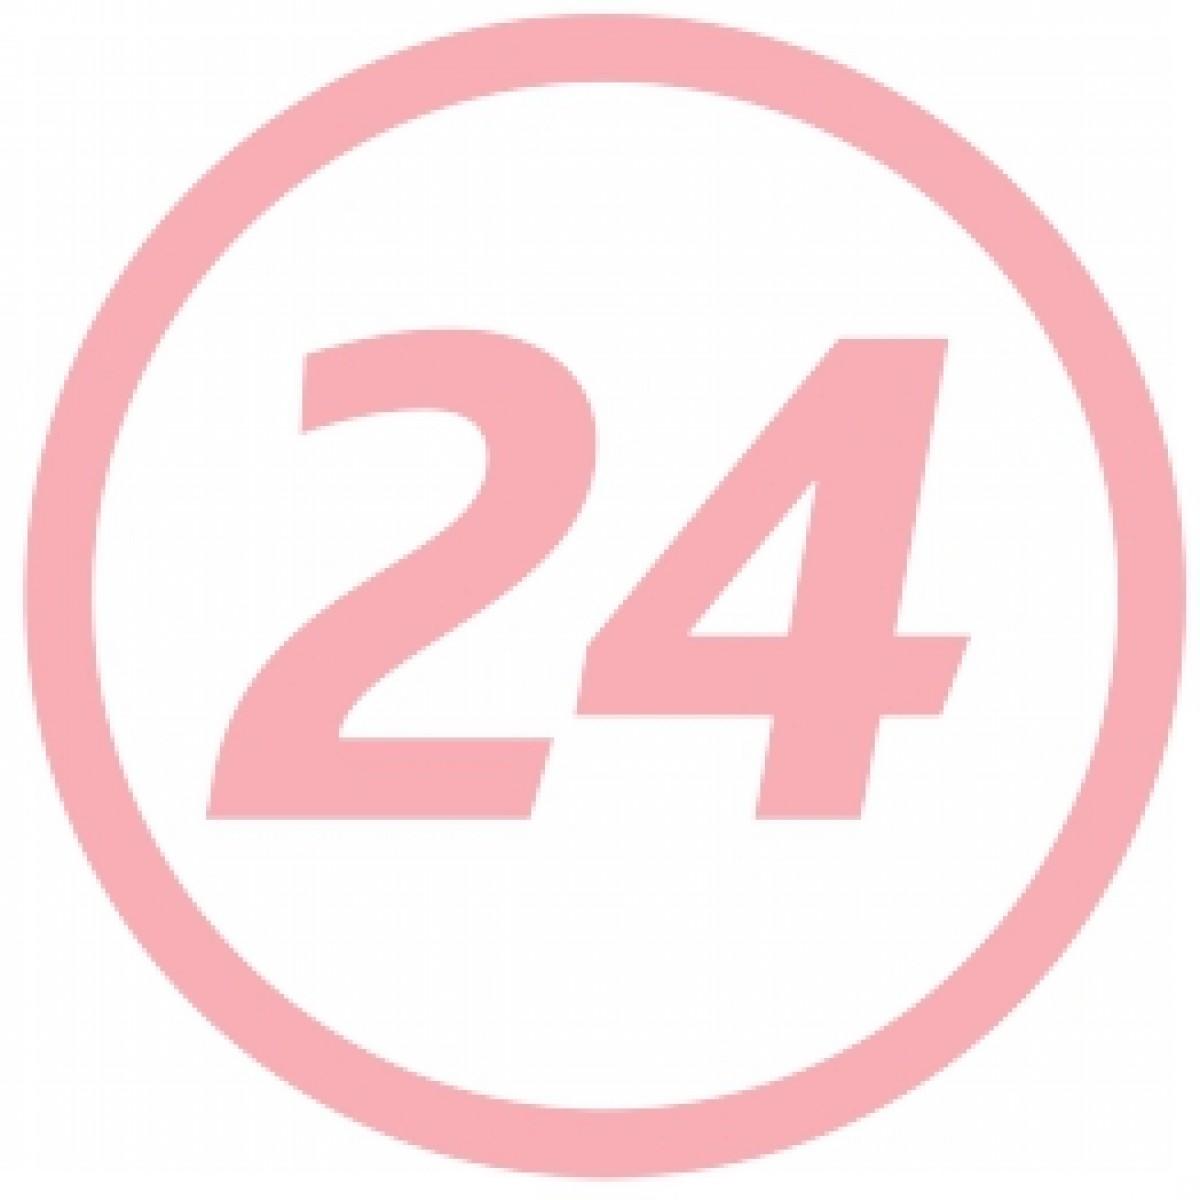 Ducray A-Derma Protect AD Crema Atopie SPF 50+ Crema,150m